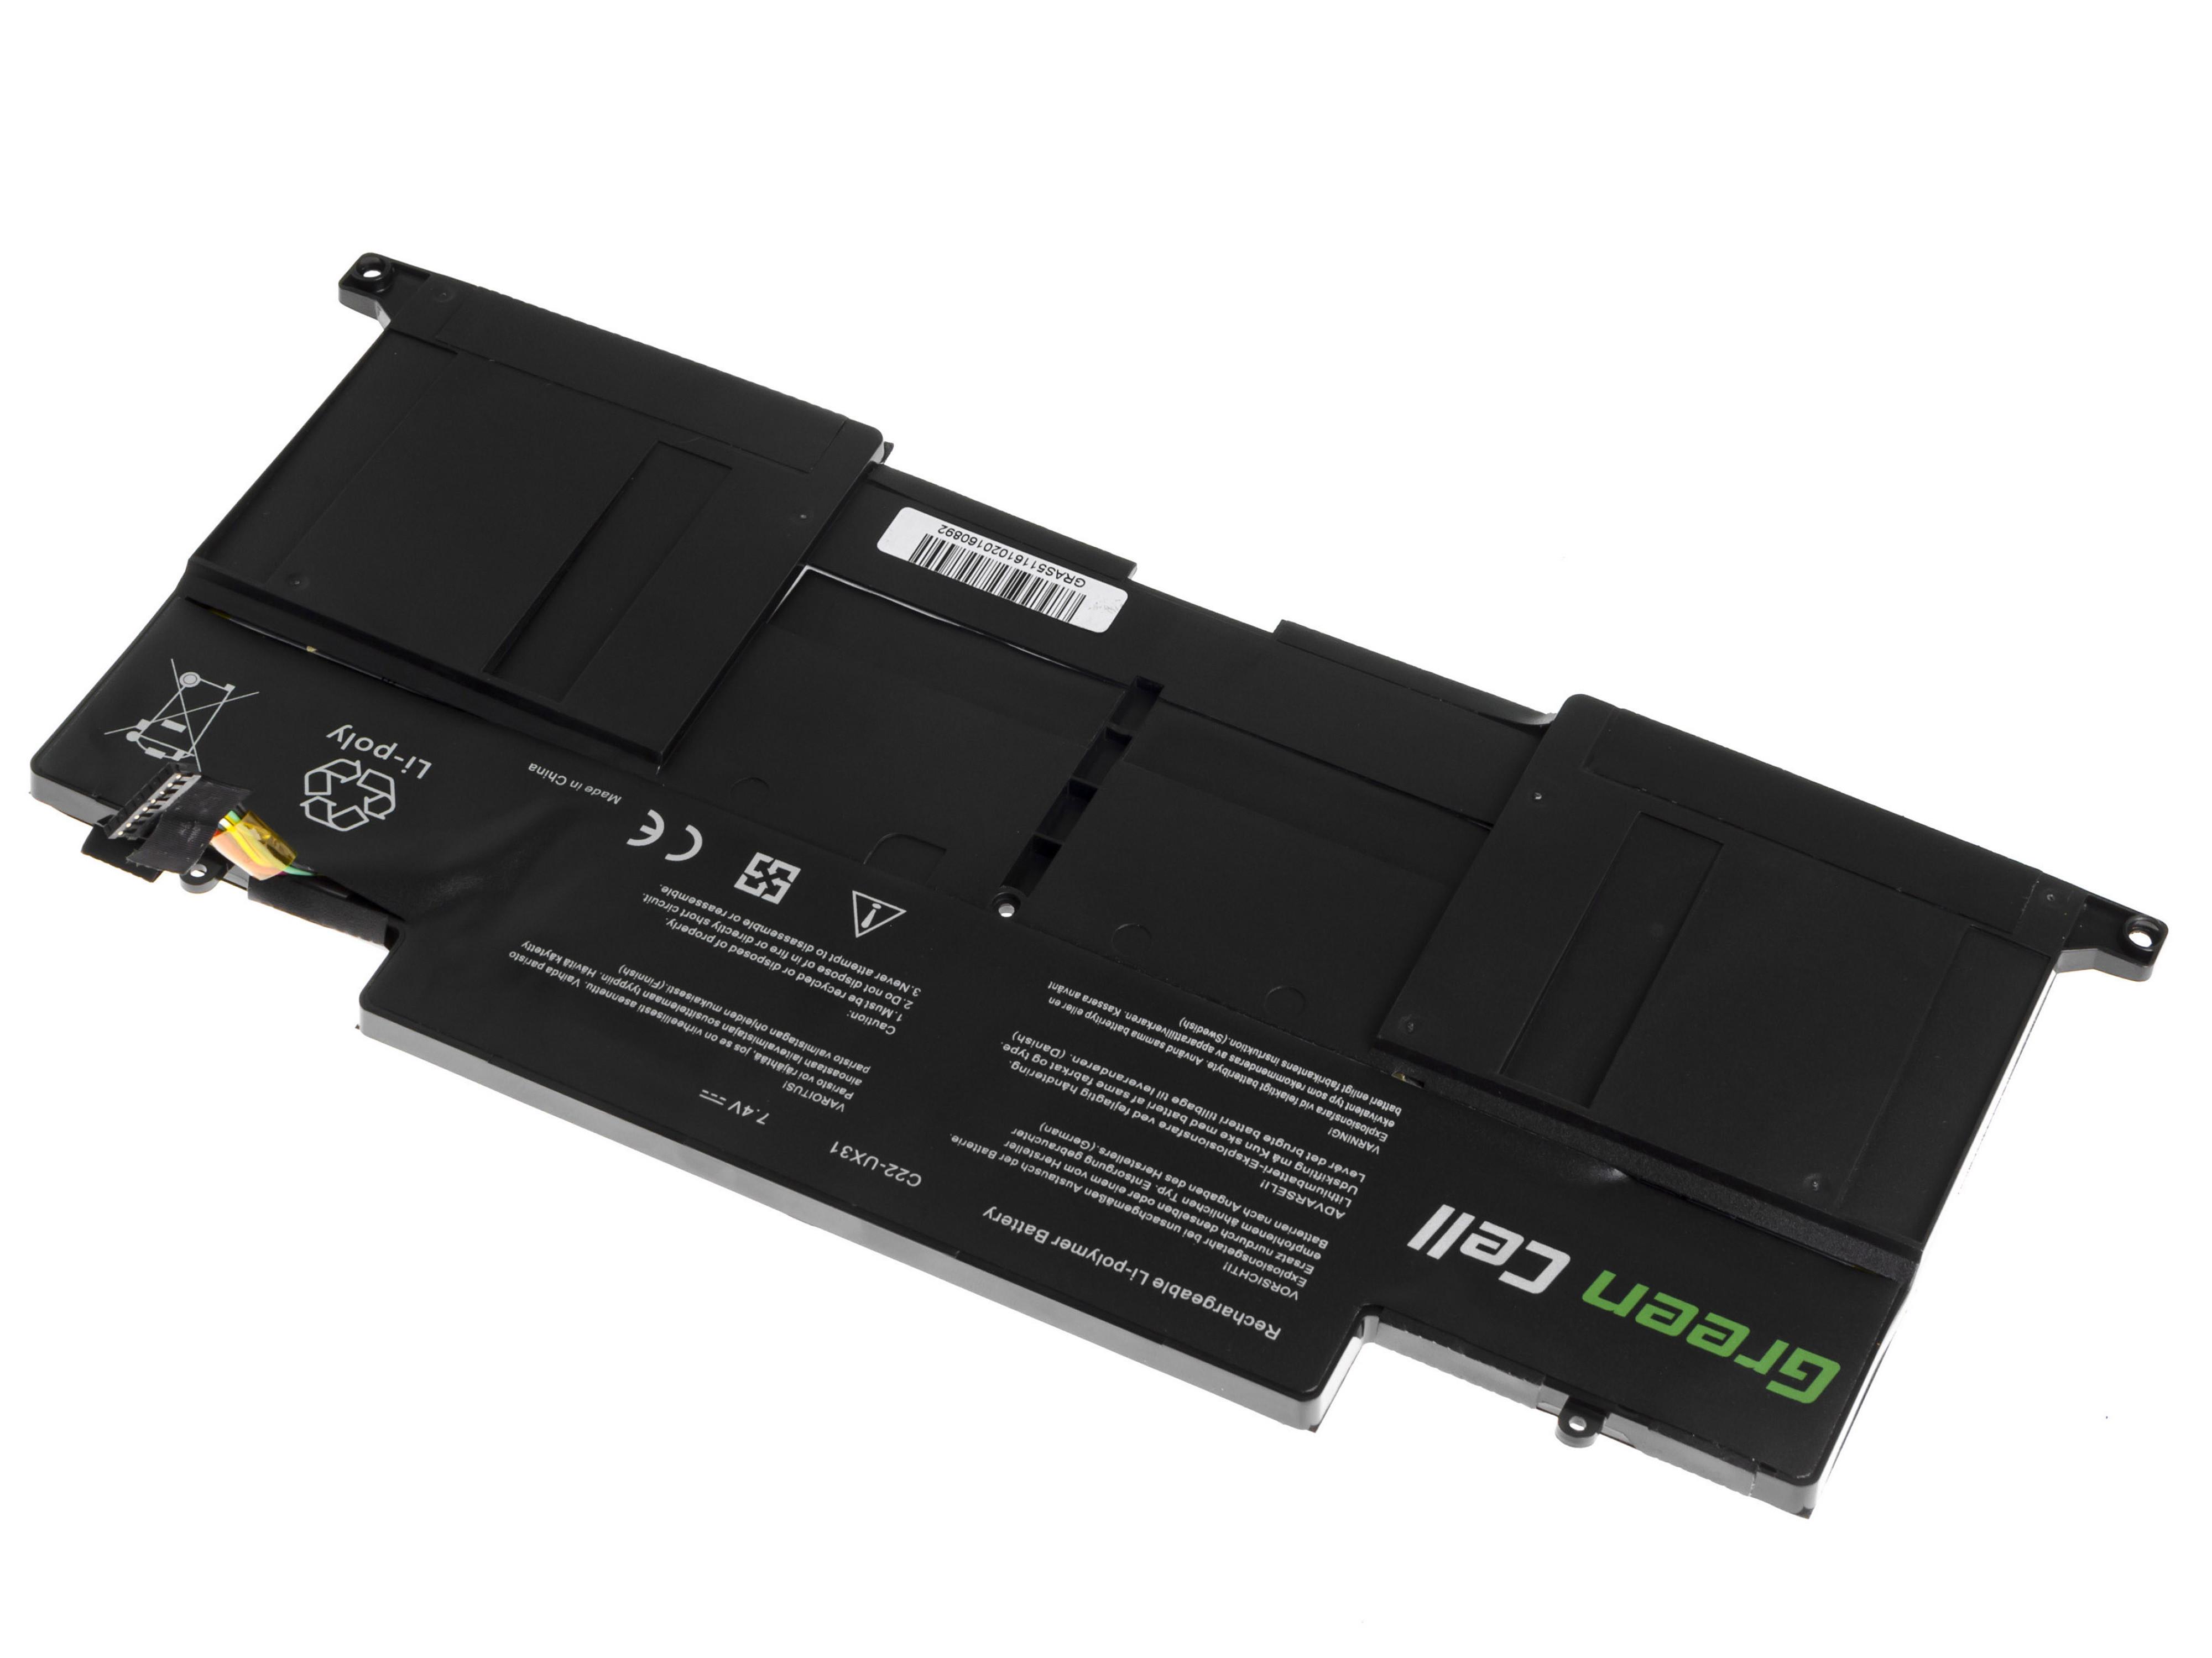 Green Cell AS72 Baterie Asus ZenBook UX31/UX31A/UX31E/UX31LA 6800mAh Li-Pol – neoriginální